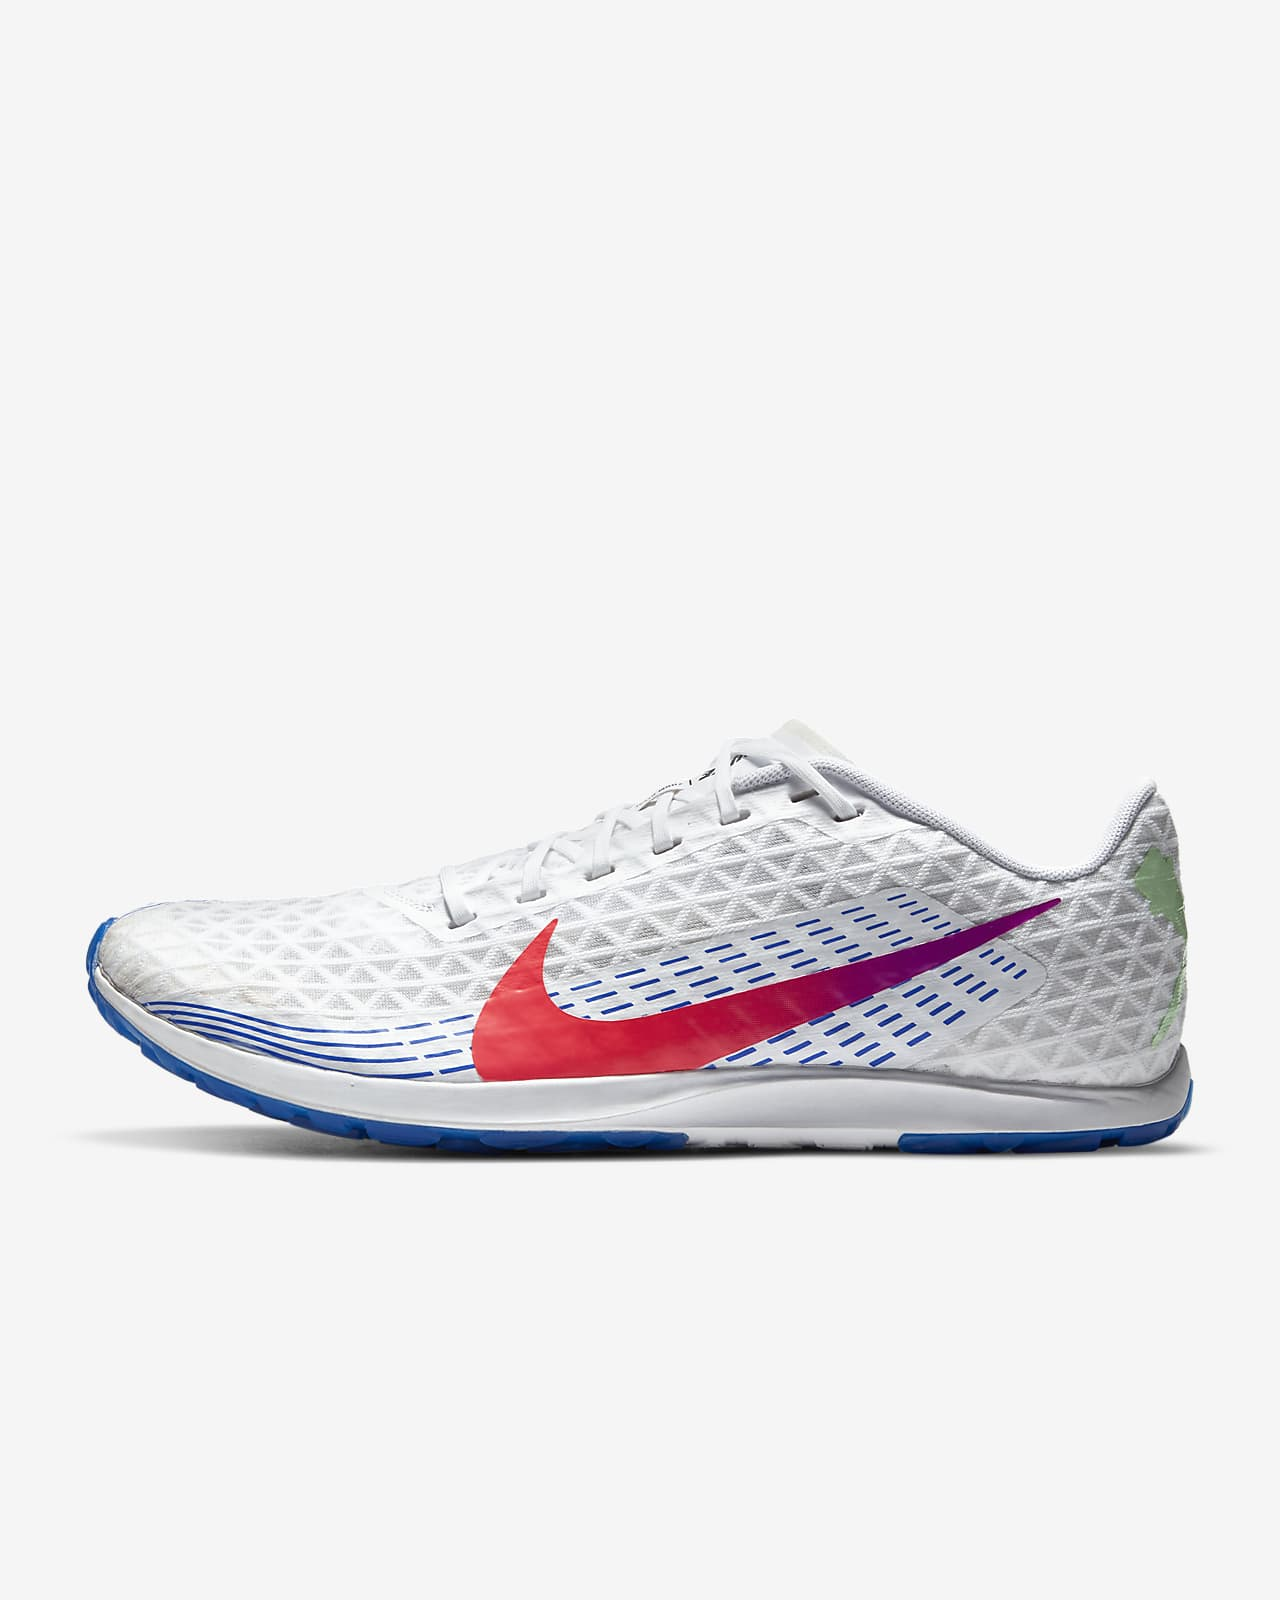 Nike Zoom Rival XC (2019)-banepigsko (unisex)